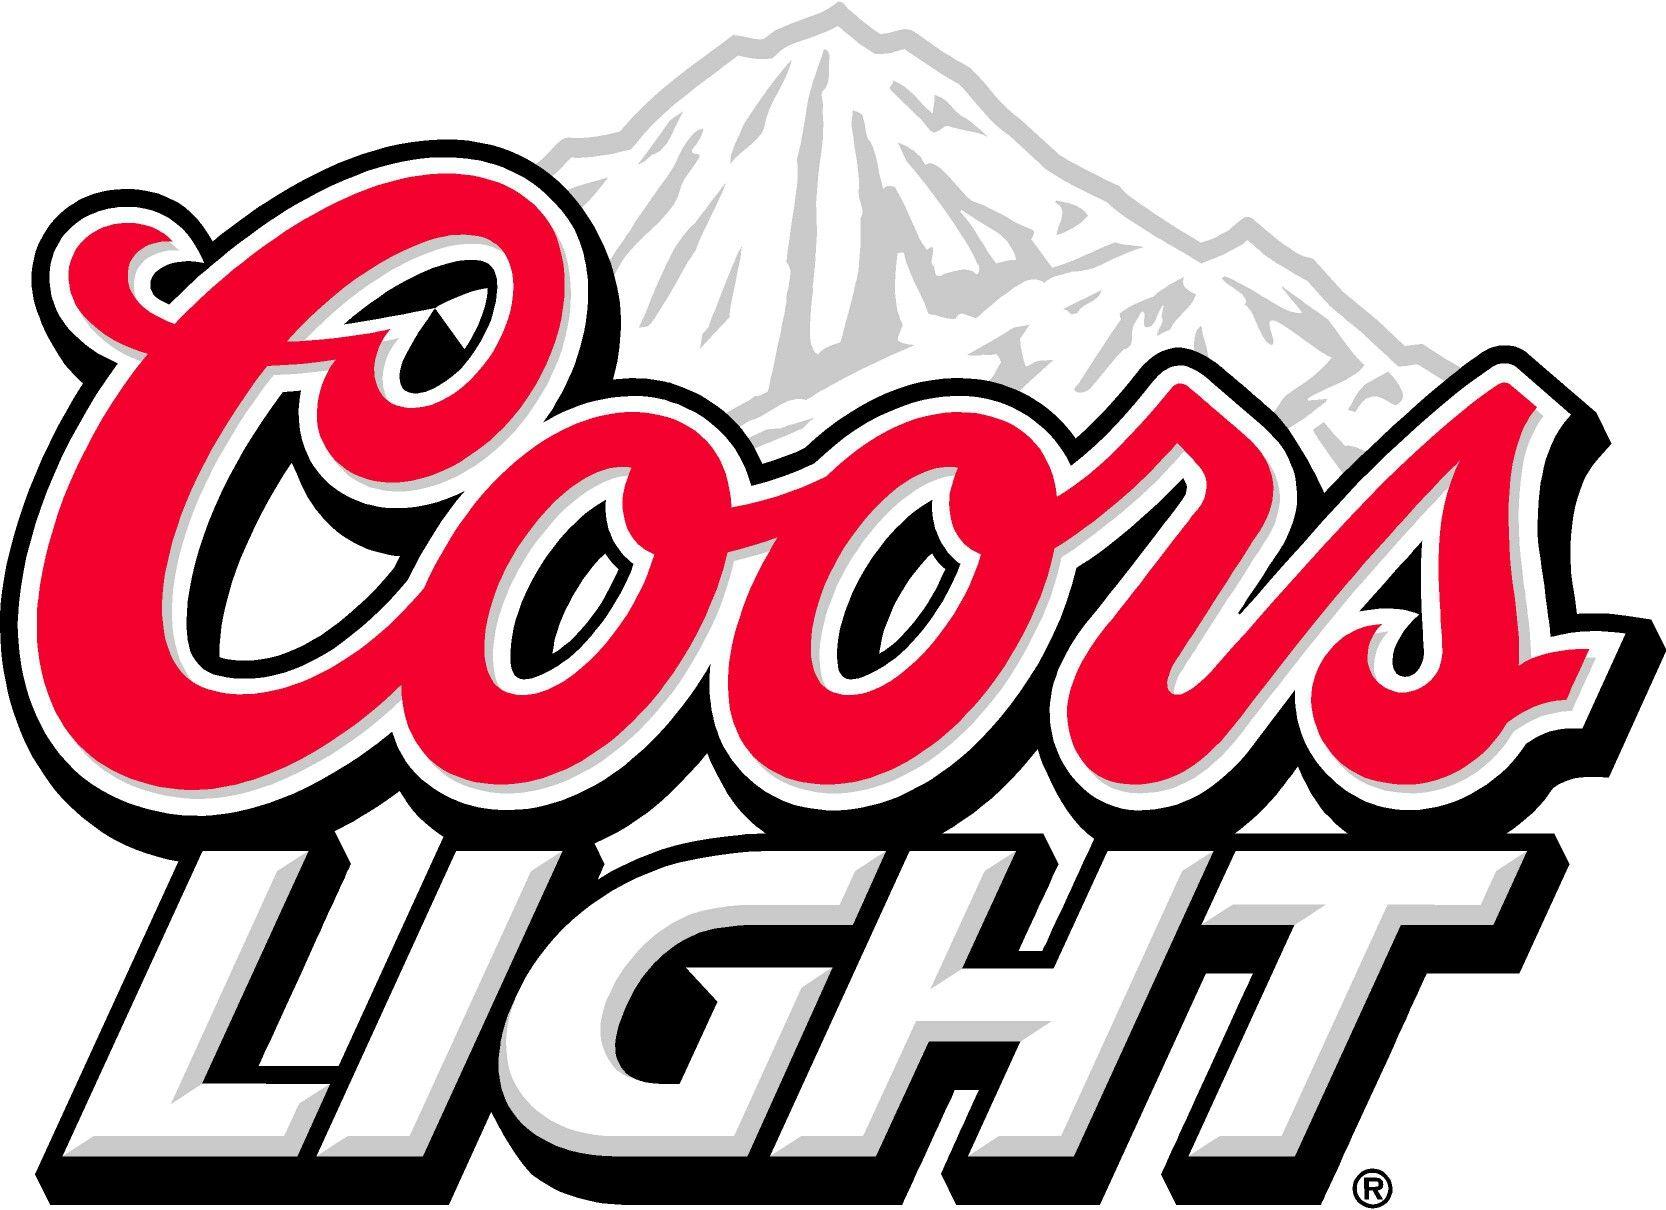 Coors light logo clipart clip transparent download Coors light stencil | stencils | Beer, Beer pong tables, Logos clip transparent download